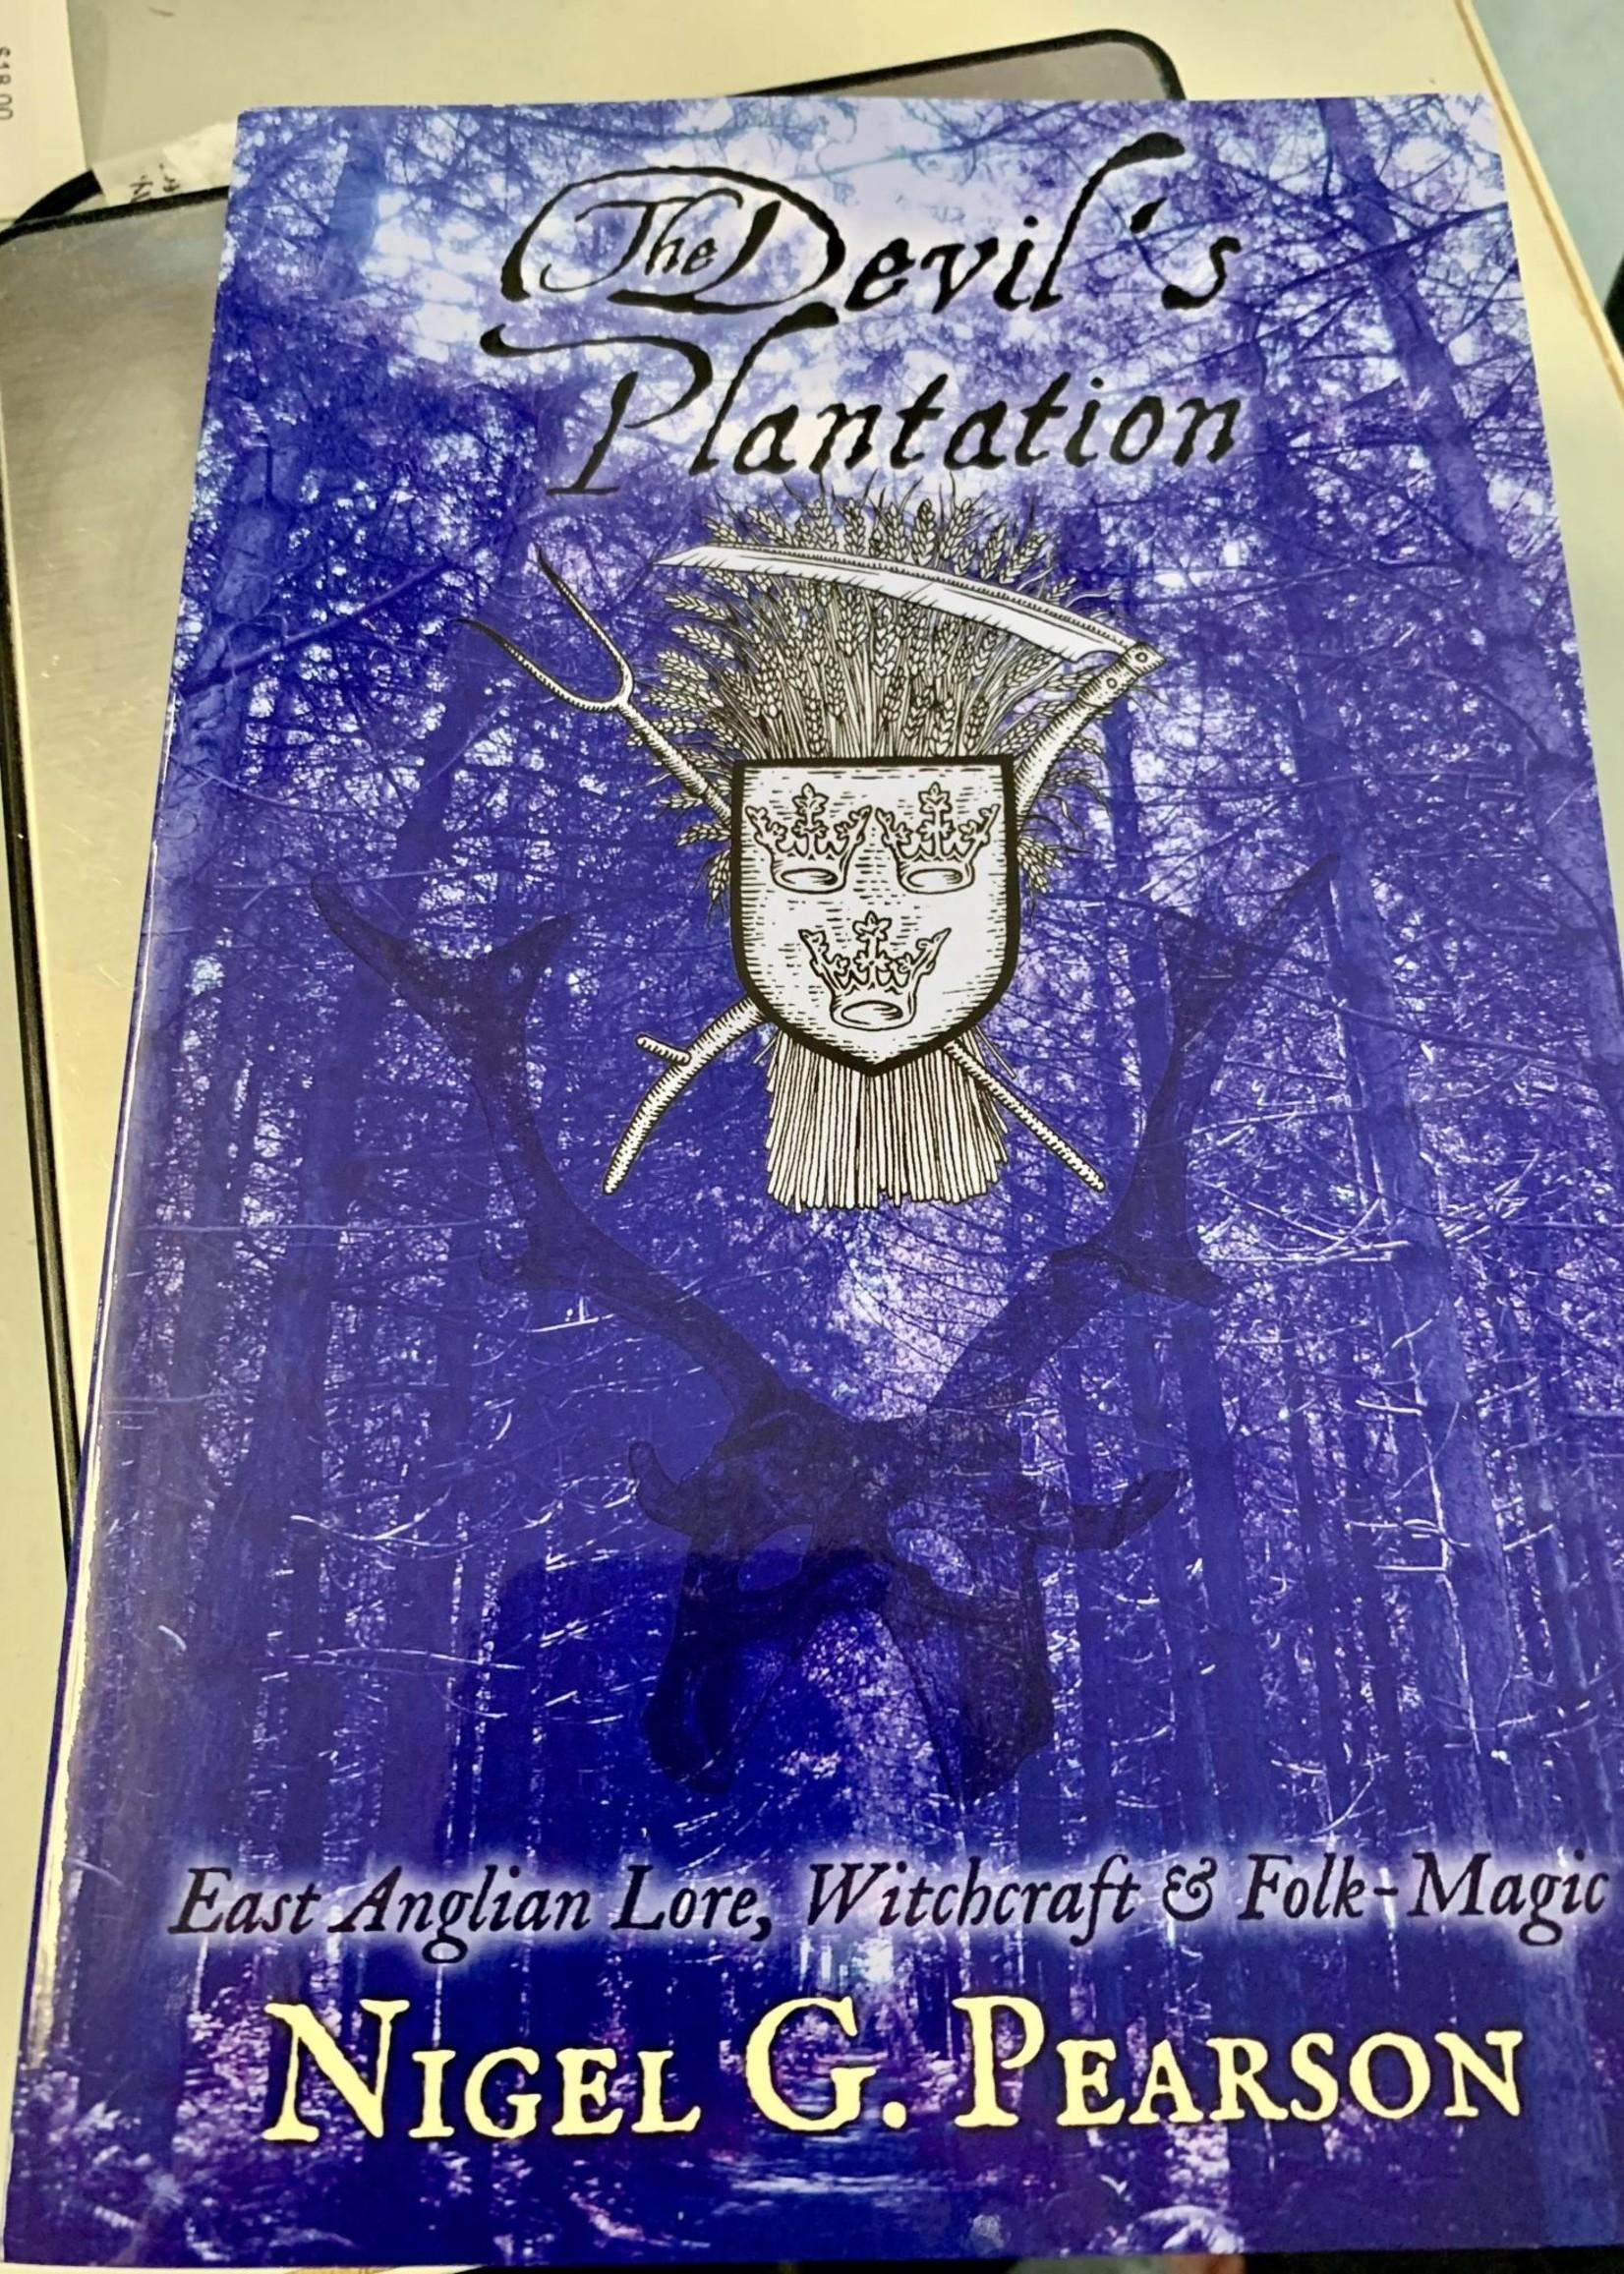 The Devil's Plantation -  BY NIGEL G. PEARSON